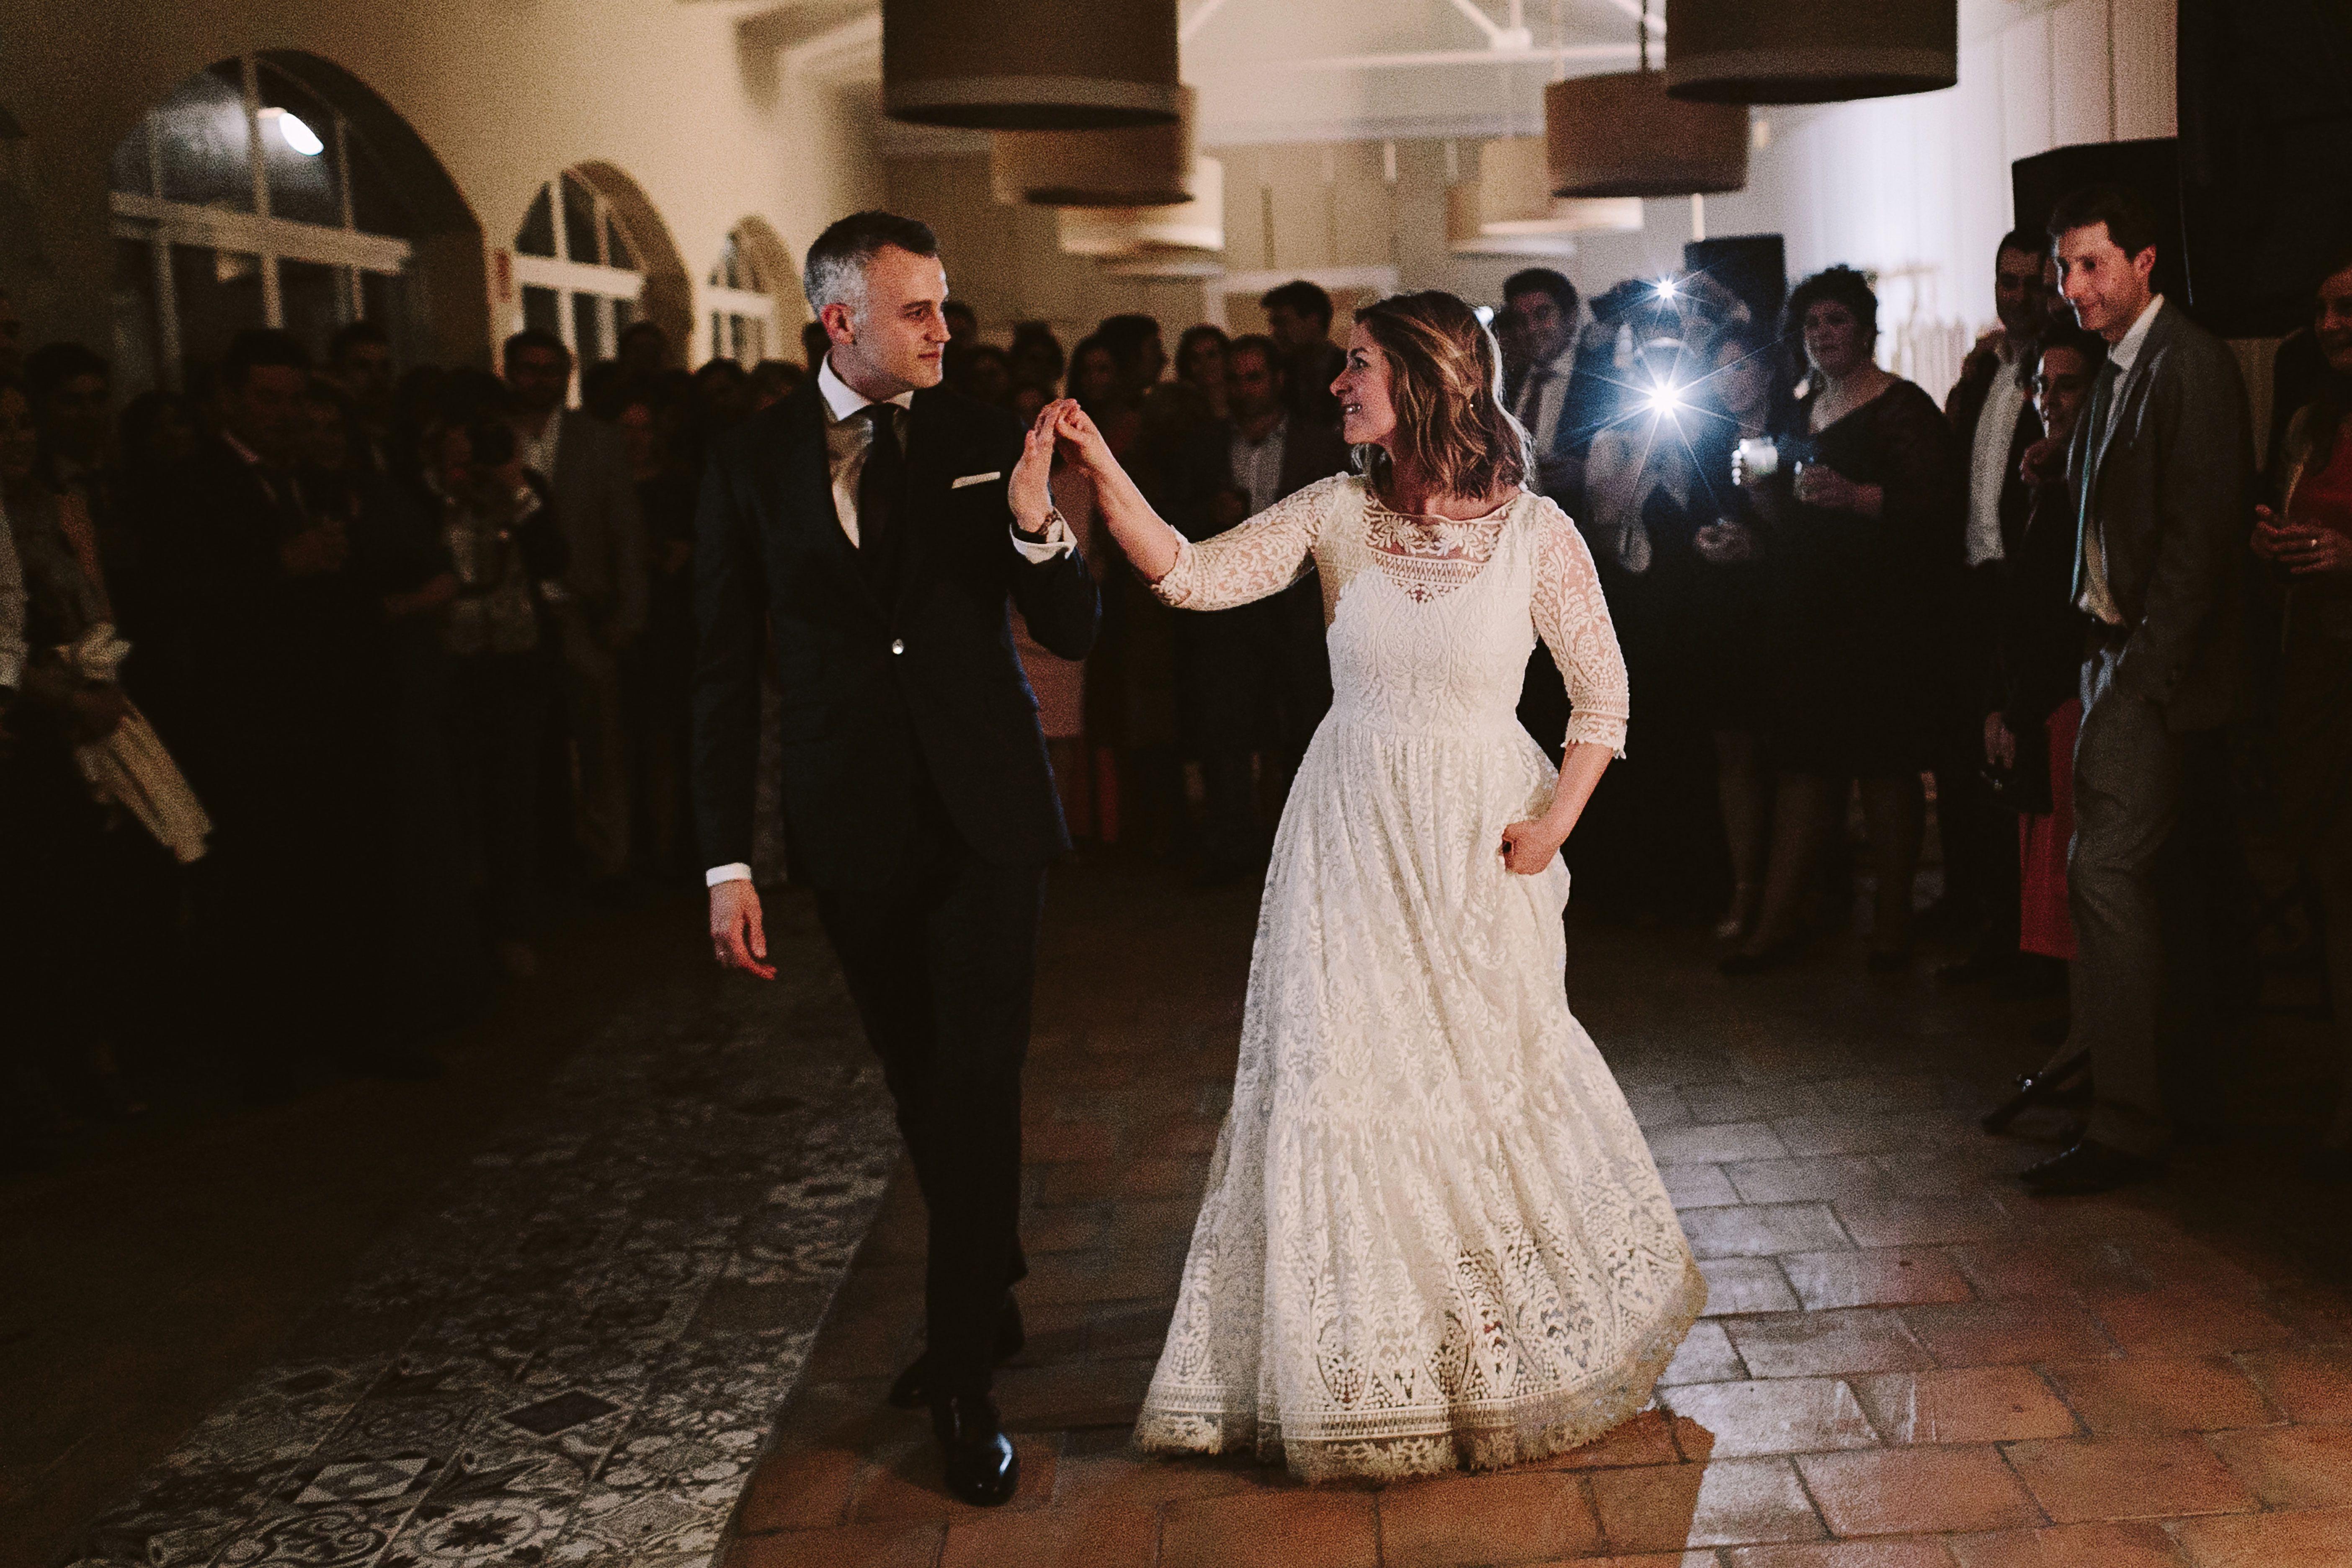 Bereziboda Ide y Rubén Berezi Moments Baile Novios Alicia Rueda Atelier Scalpers Company, Monasterio del Espino